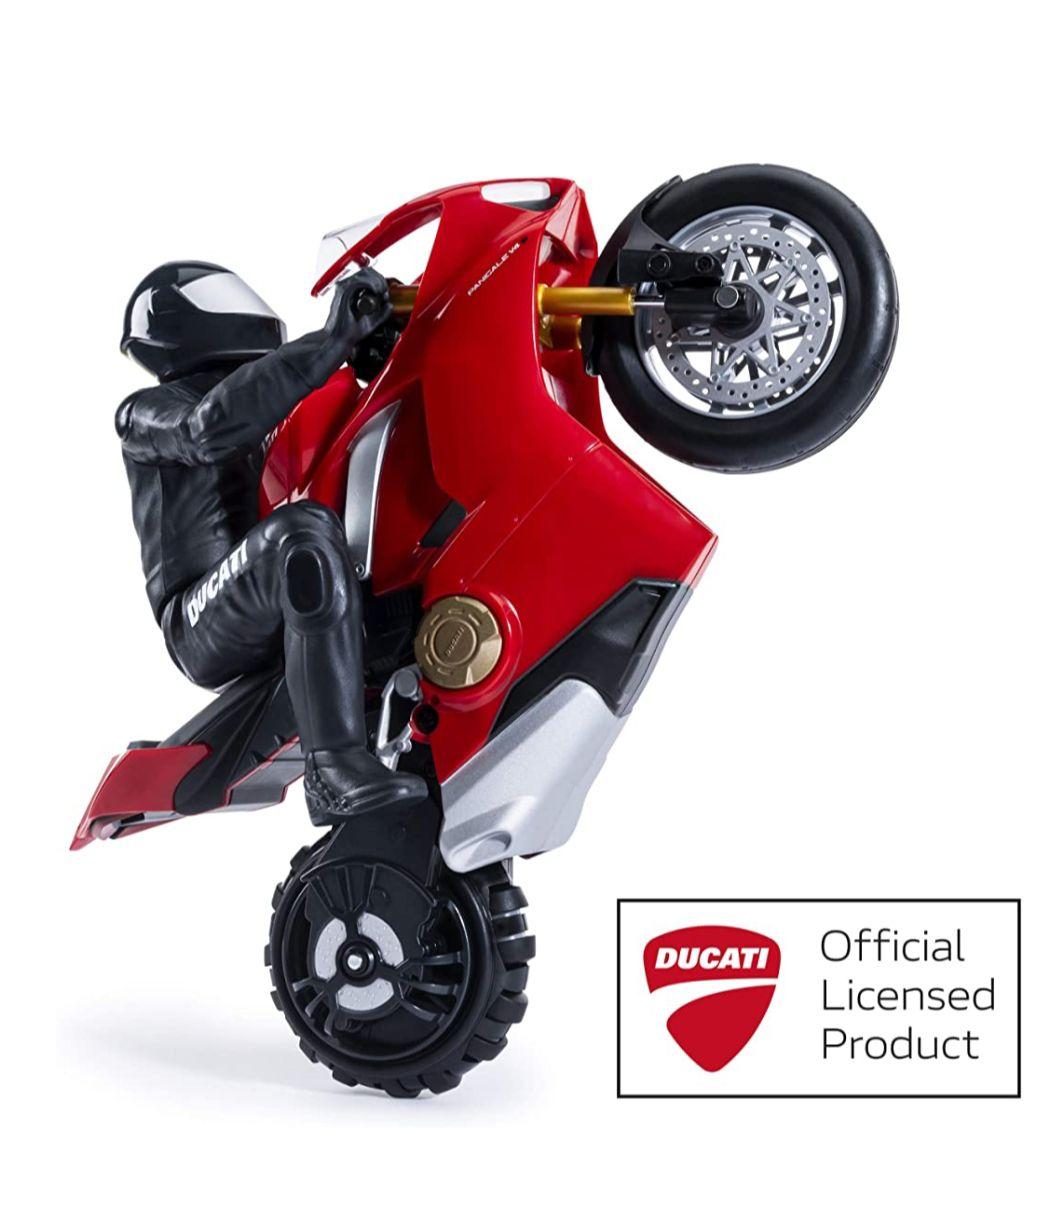 Upriser 6053427 Upriser Ducati, Authentic Panigale V4 S Remote Control Motorcycle, 1:6 Scale, Multicolour £37.94 @ Amazon